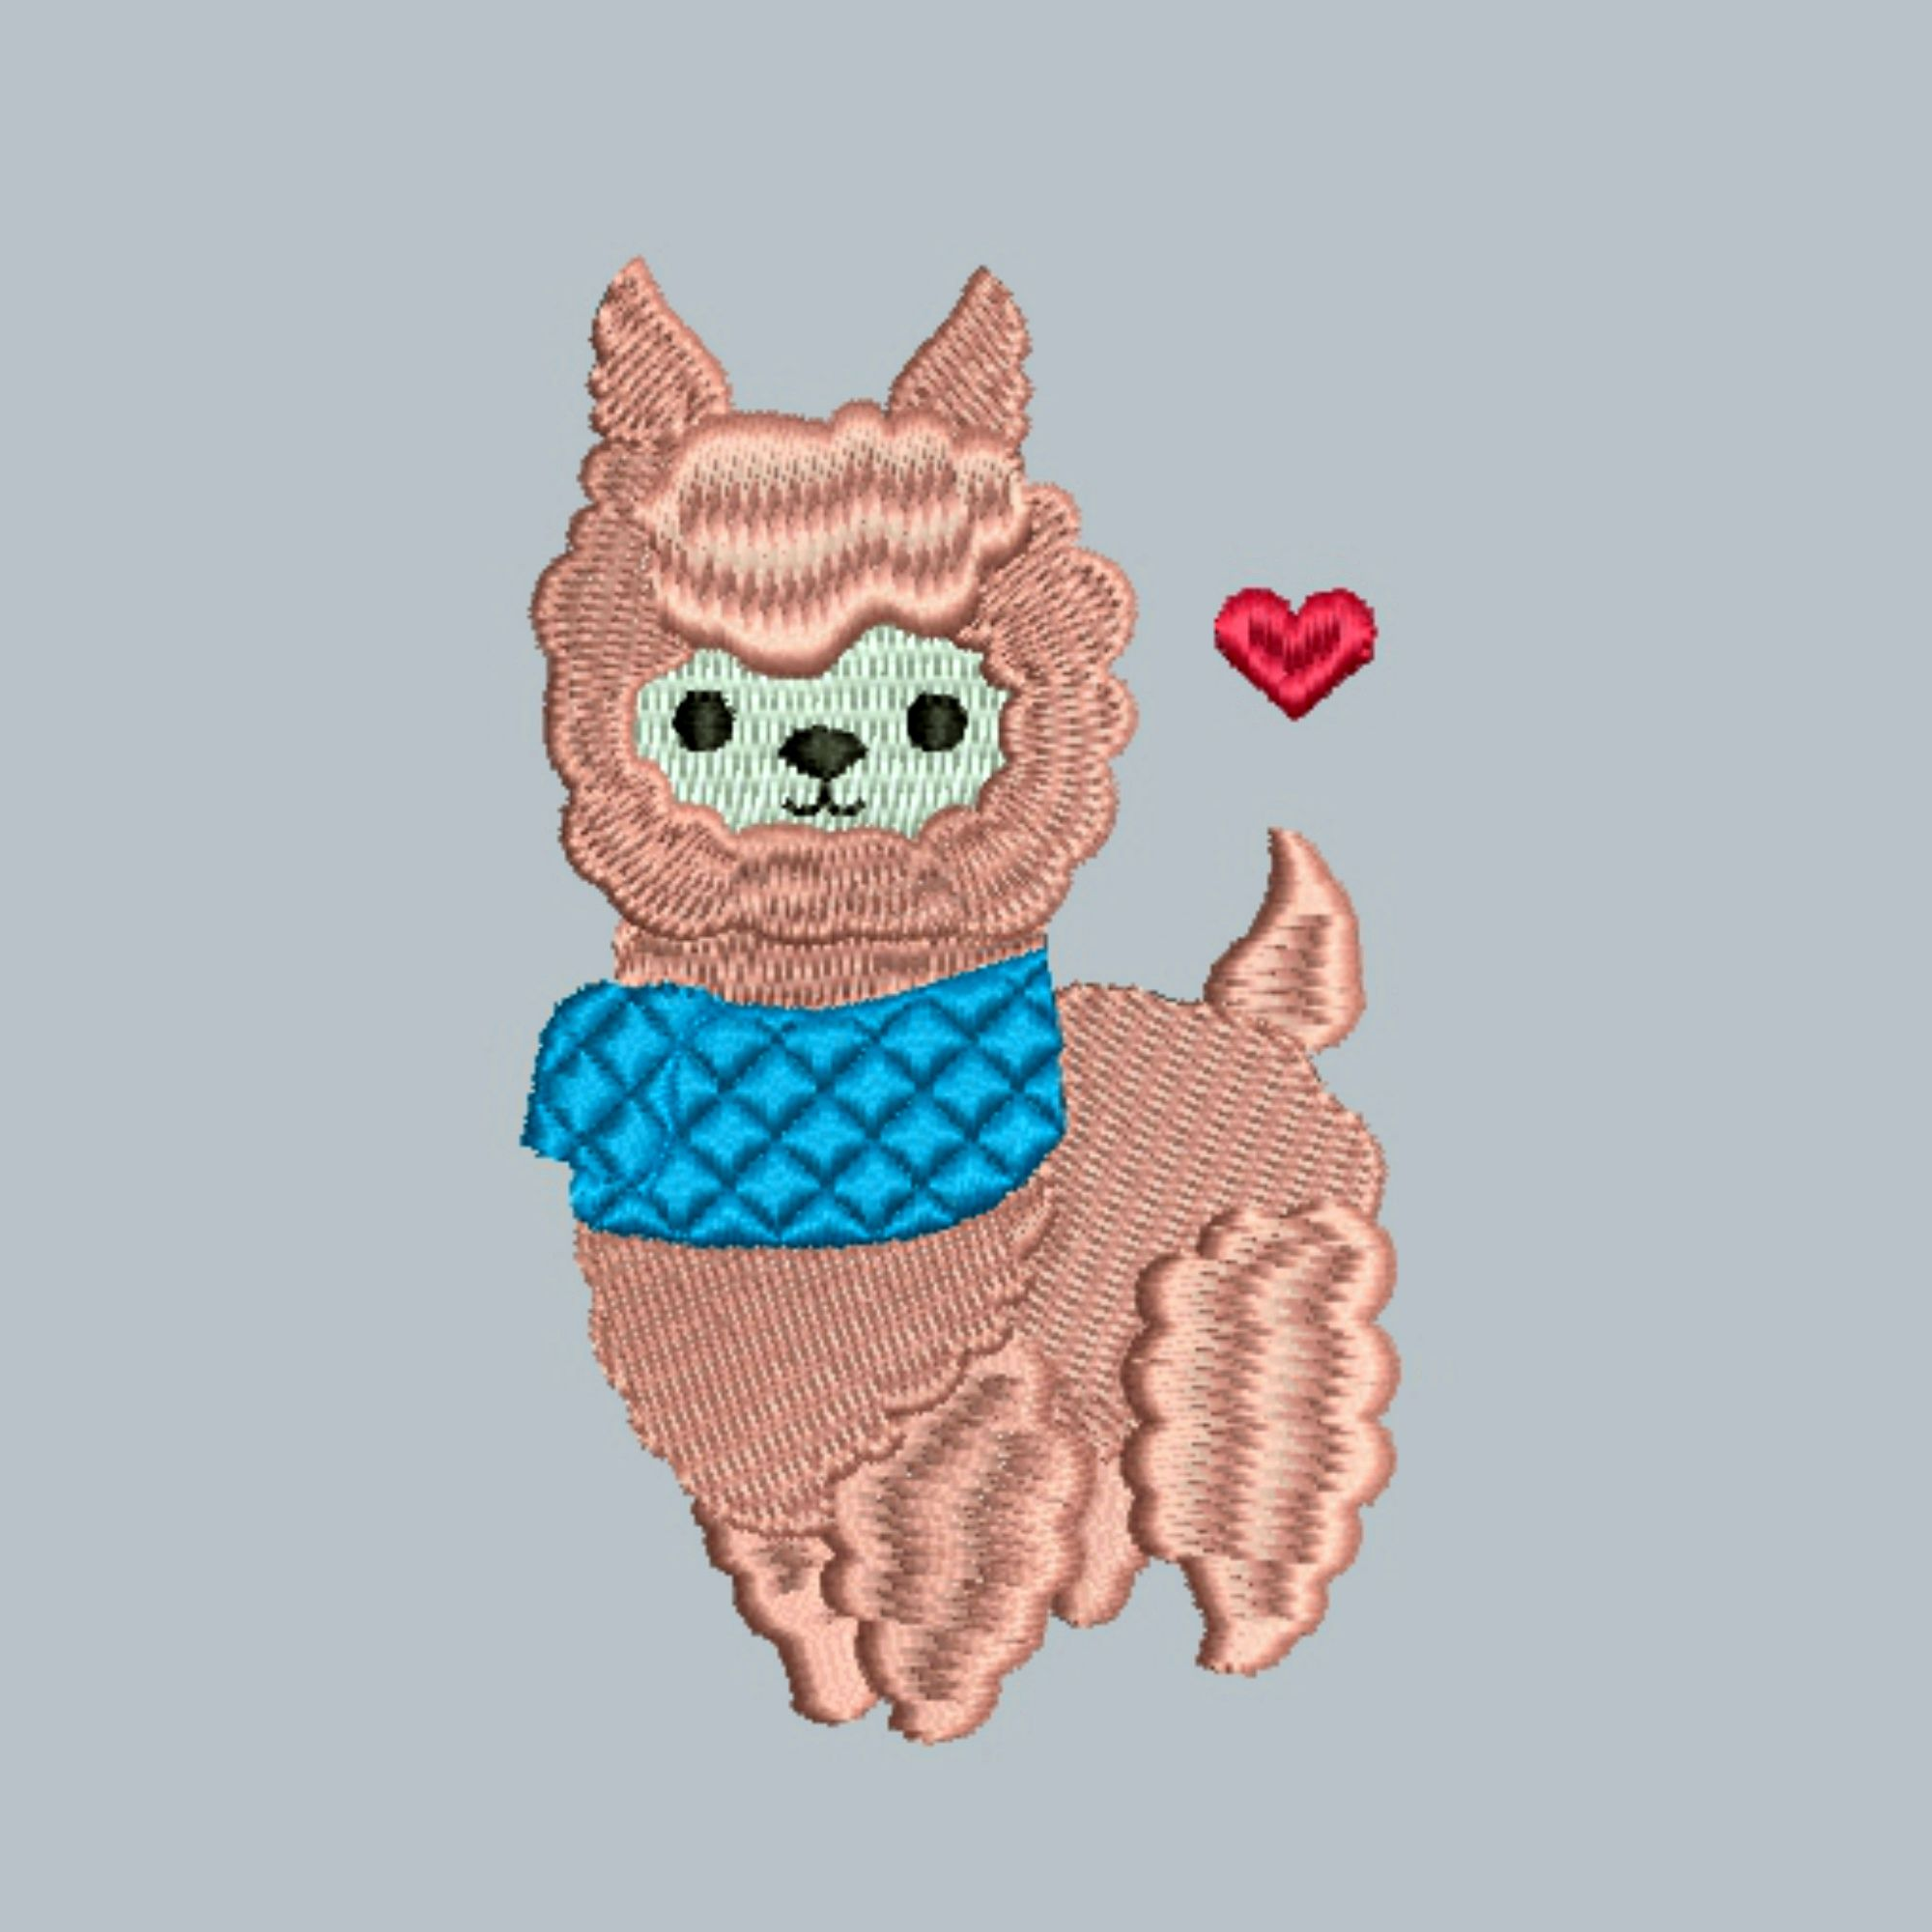 Easter present Machine embroidery design Lama applique embroidery Lama patch Cool Lama design for application Animals design